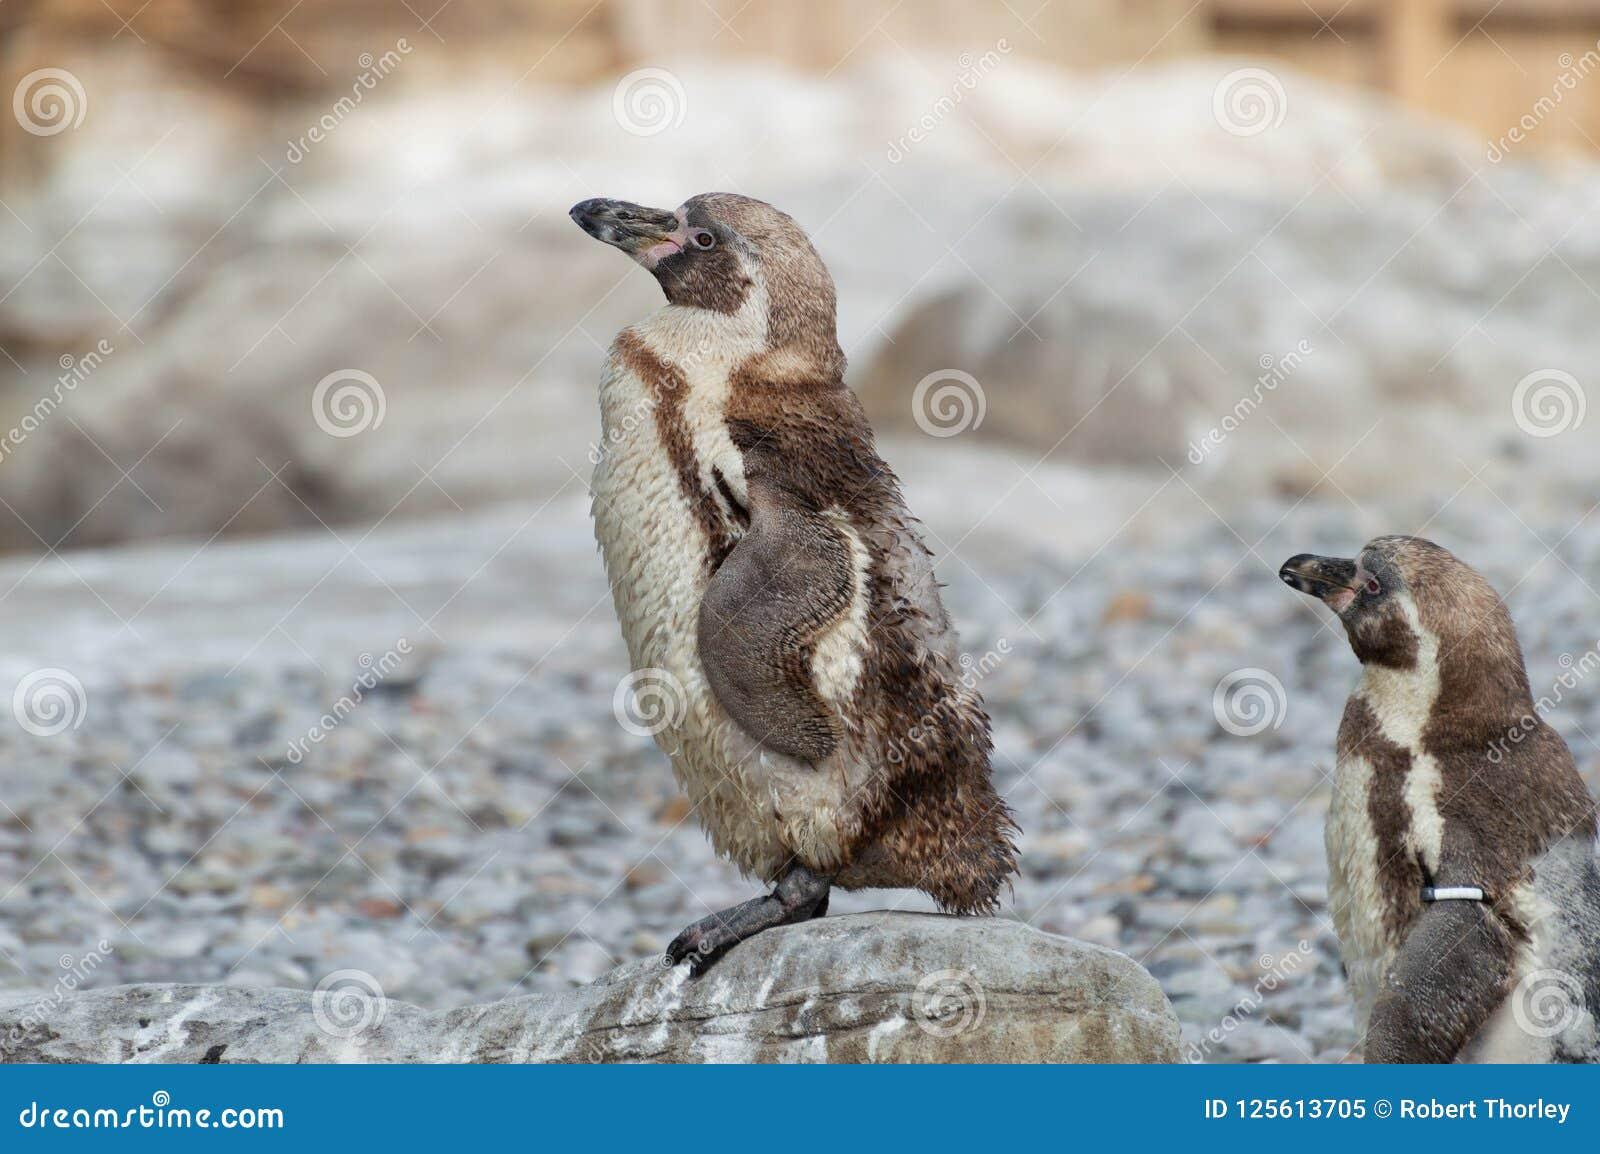 Junge Humboldt-Pinguine